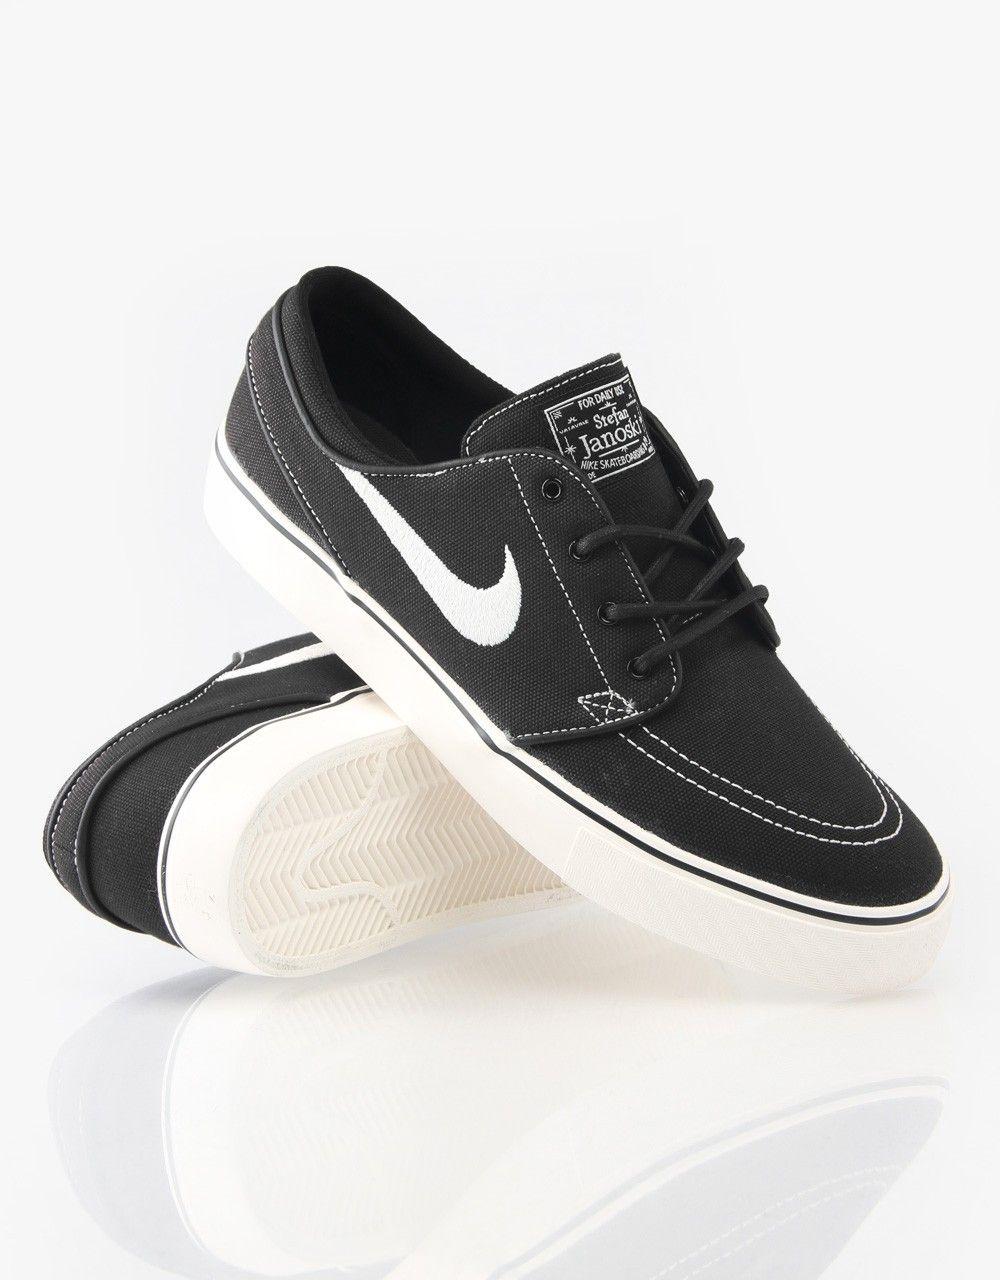 separation shoes e1c84 4bf2c Nike Skateboarding Stefan Janoski Skate Shoes